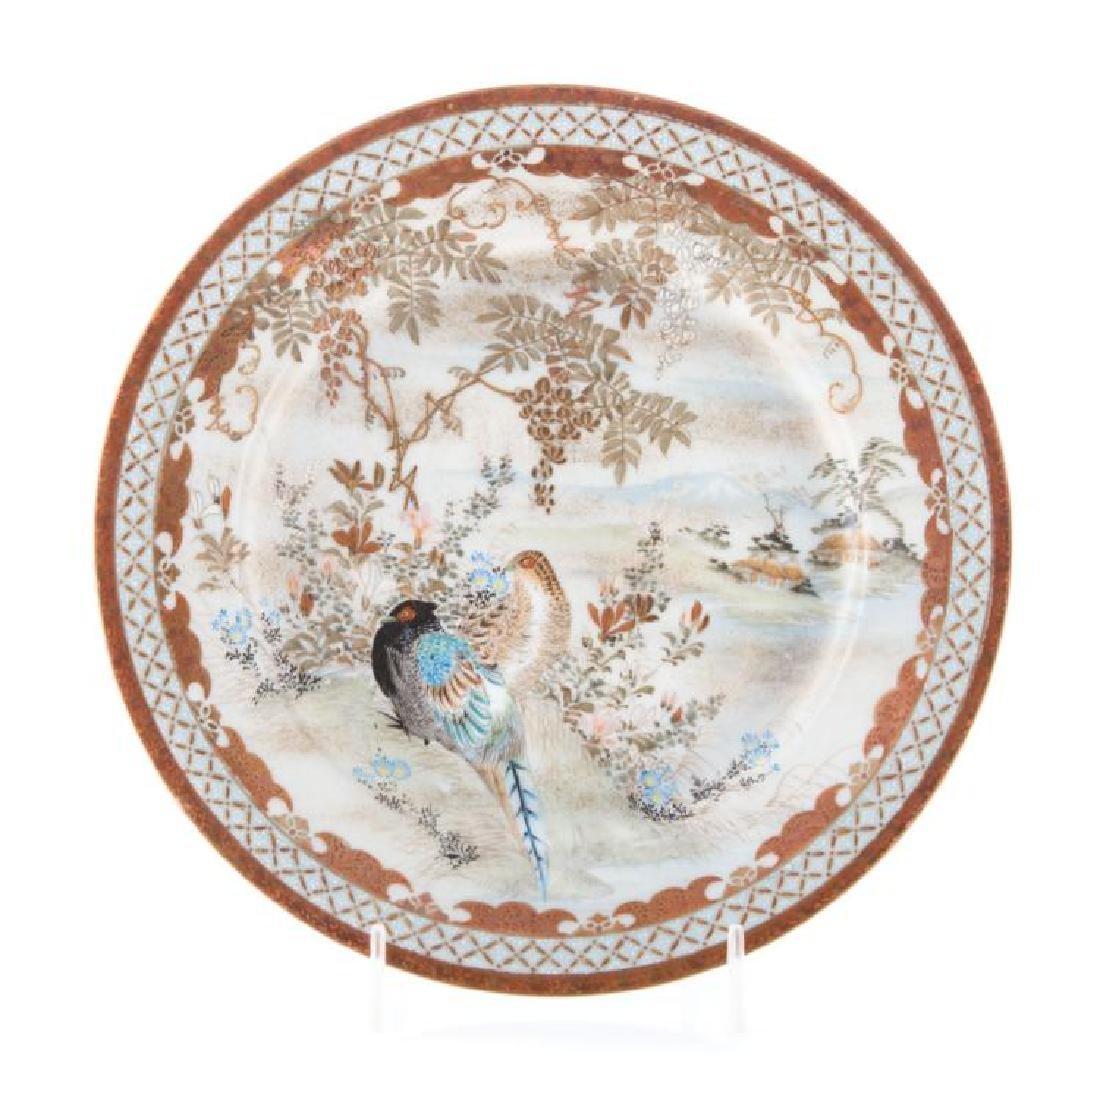 (2)  A PAIR OF JAPANESE KUTANI PORCELAIN PLATES.C224. - 3